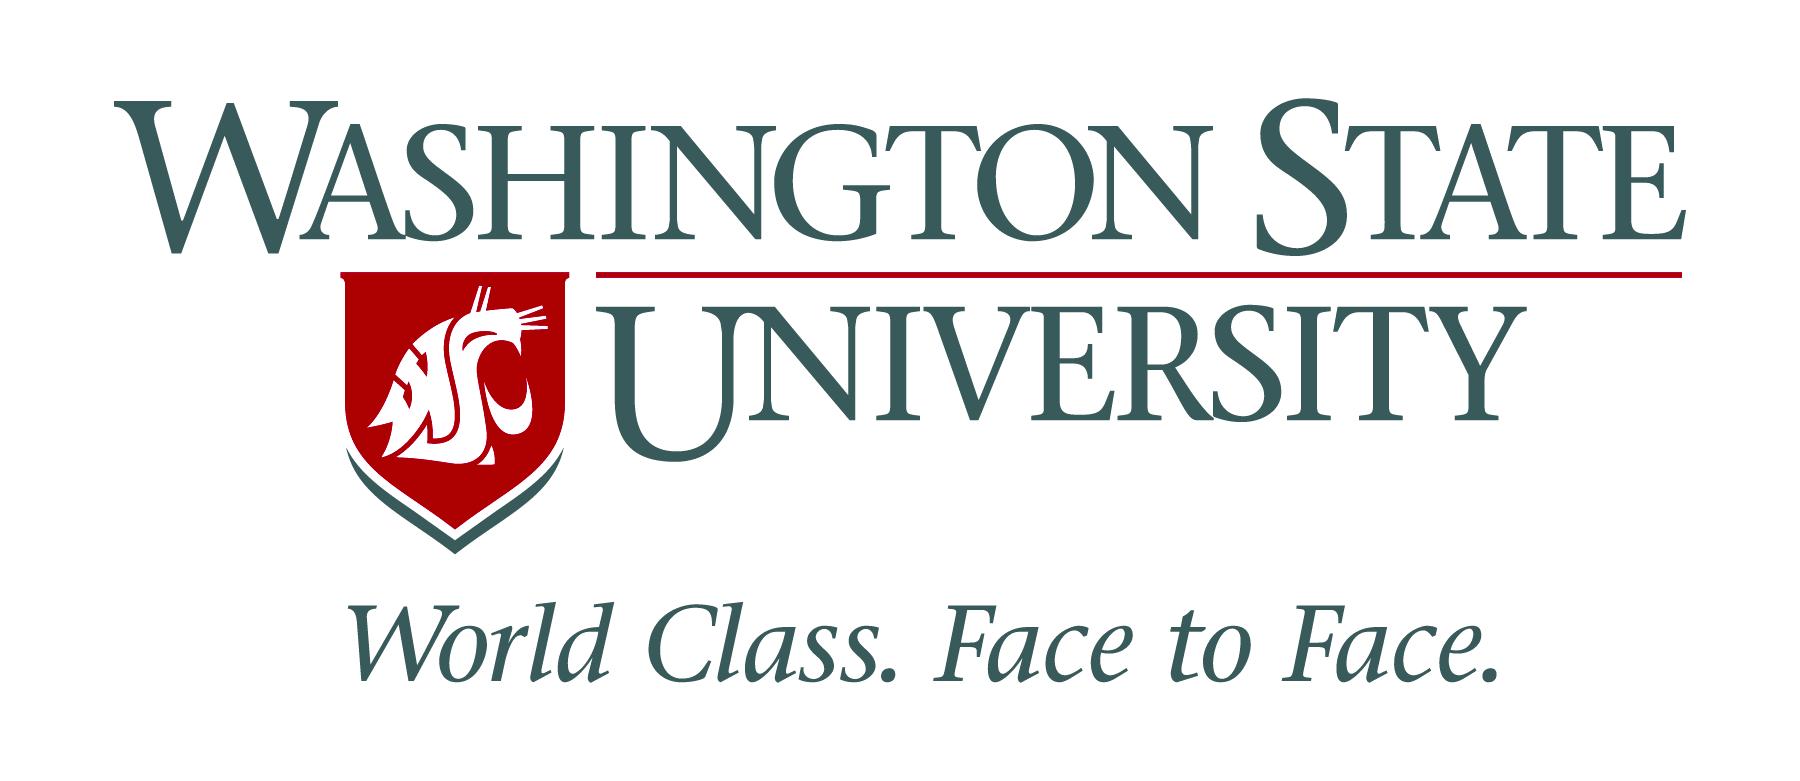 WSU_SIGNATURE_4_COLOR_12_INCH-1 Top 15 MBA Programs & Business Schools